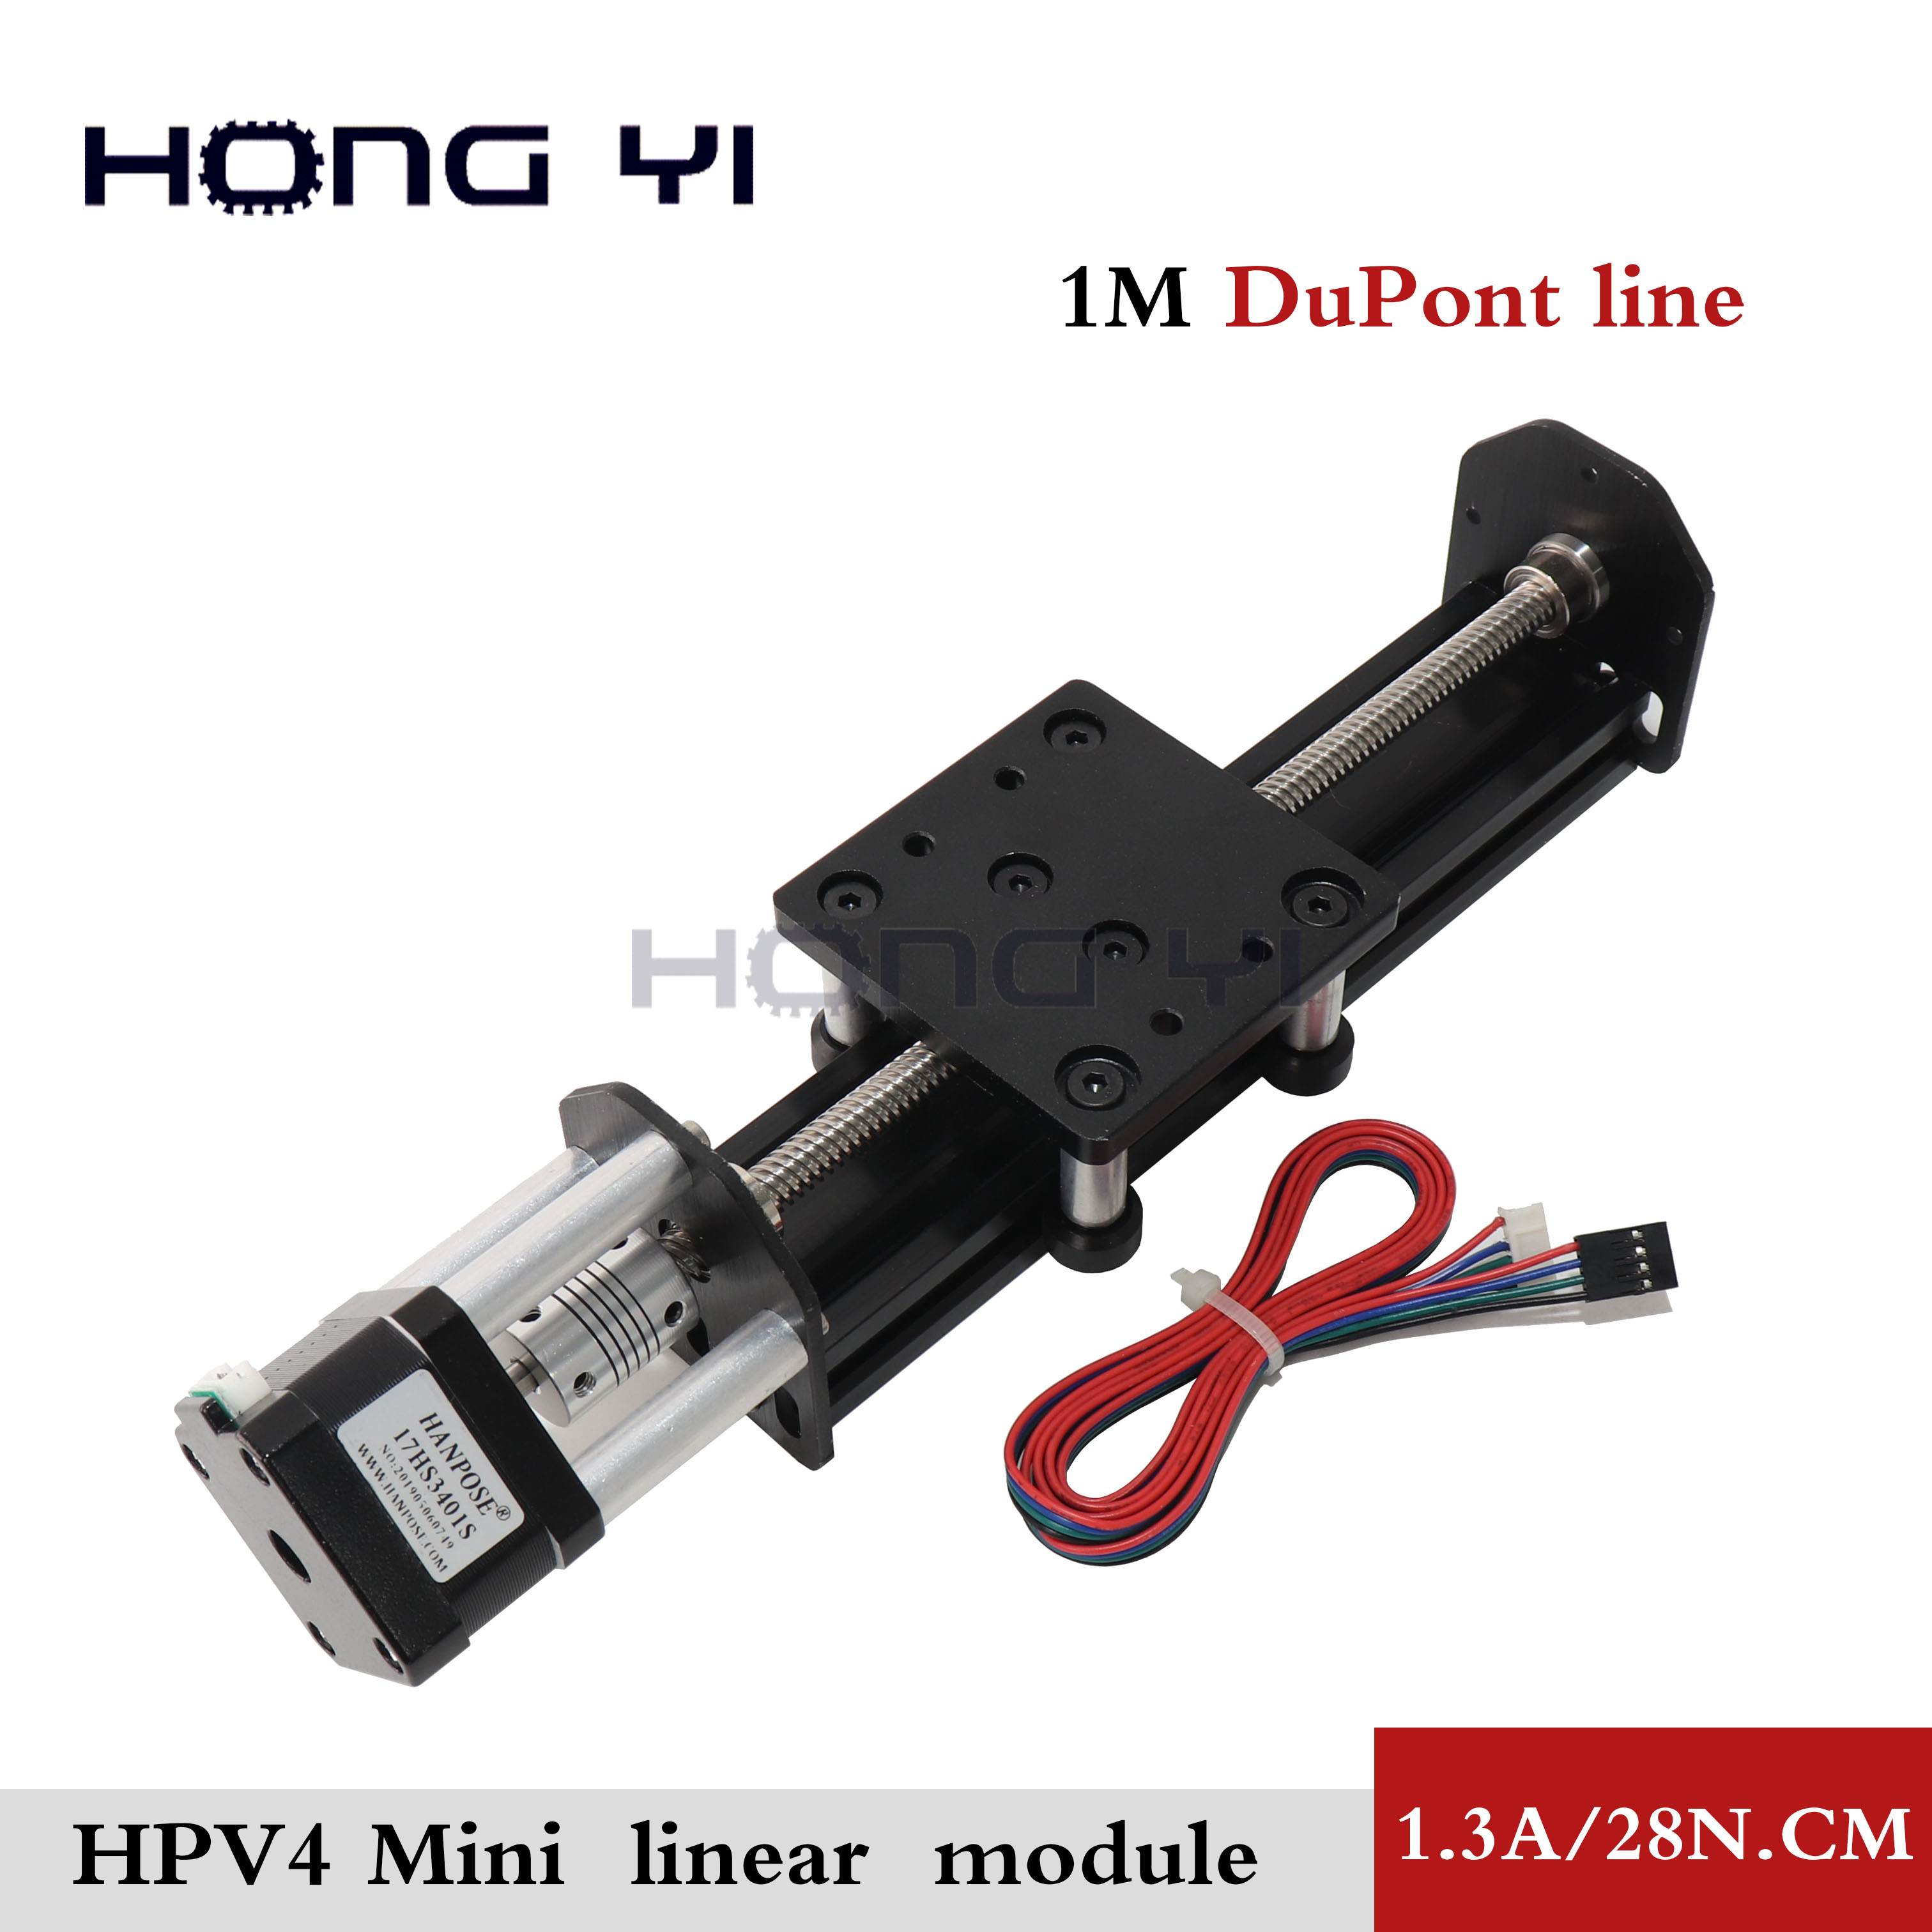 Openbuilds Mini V linear actuator Linear module HPV4 with 42 NEMA 17 stepper motor 17hs3401 1.3A 34mm for Reprap 3D printer